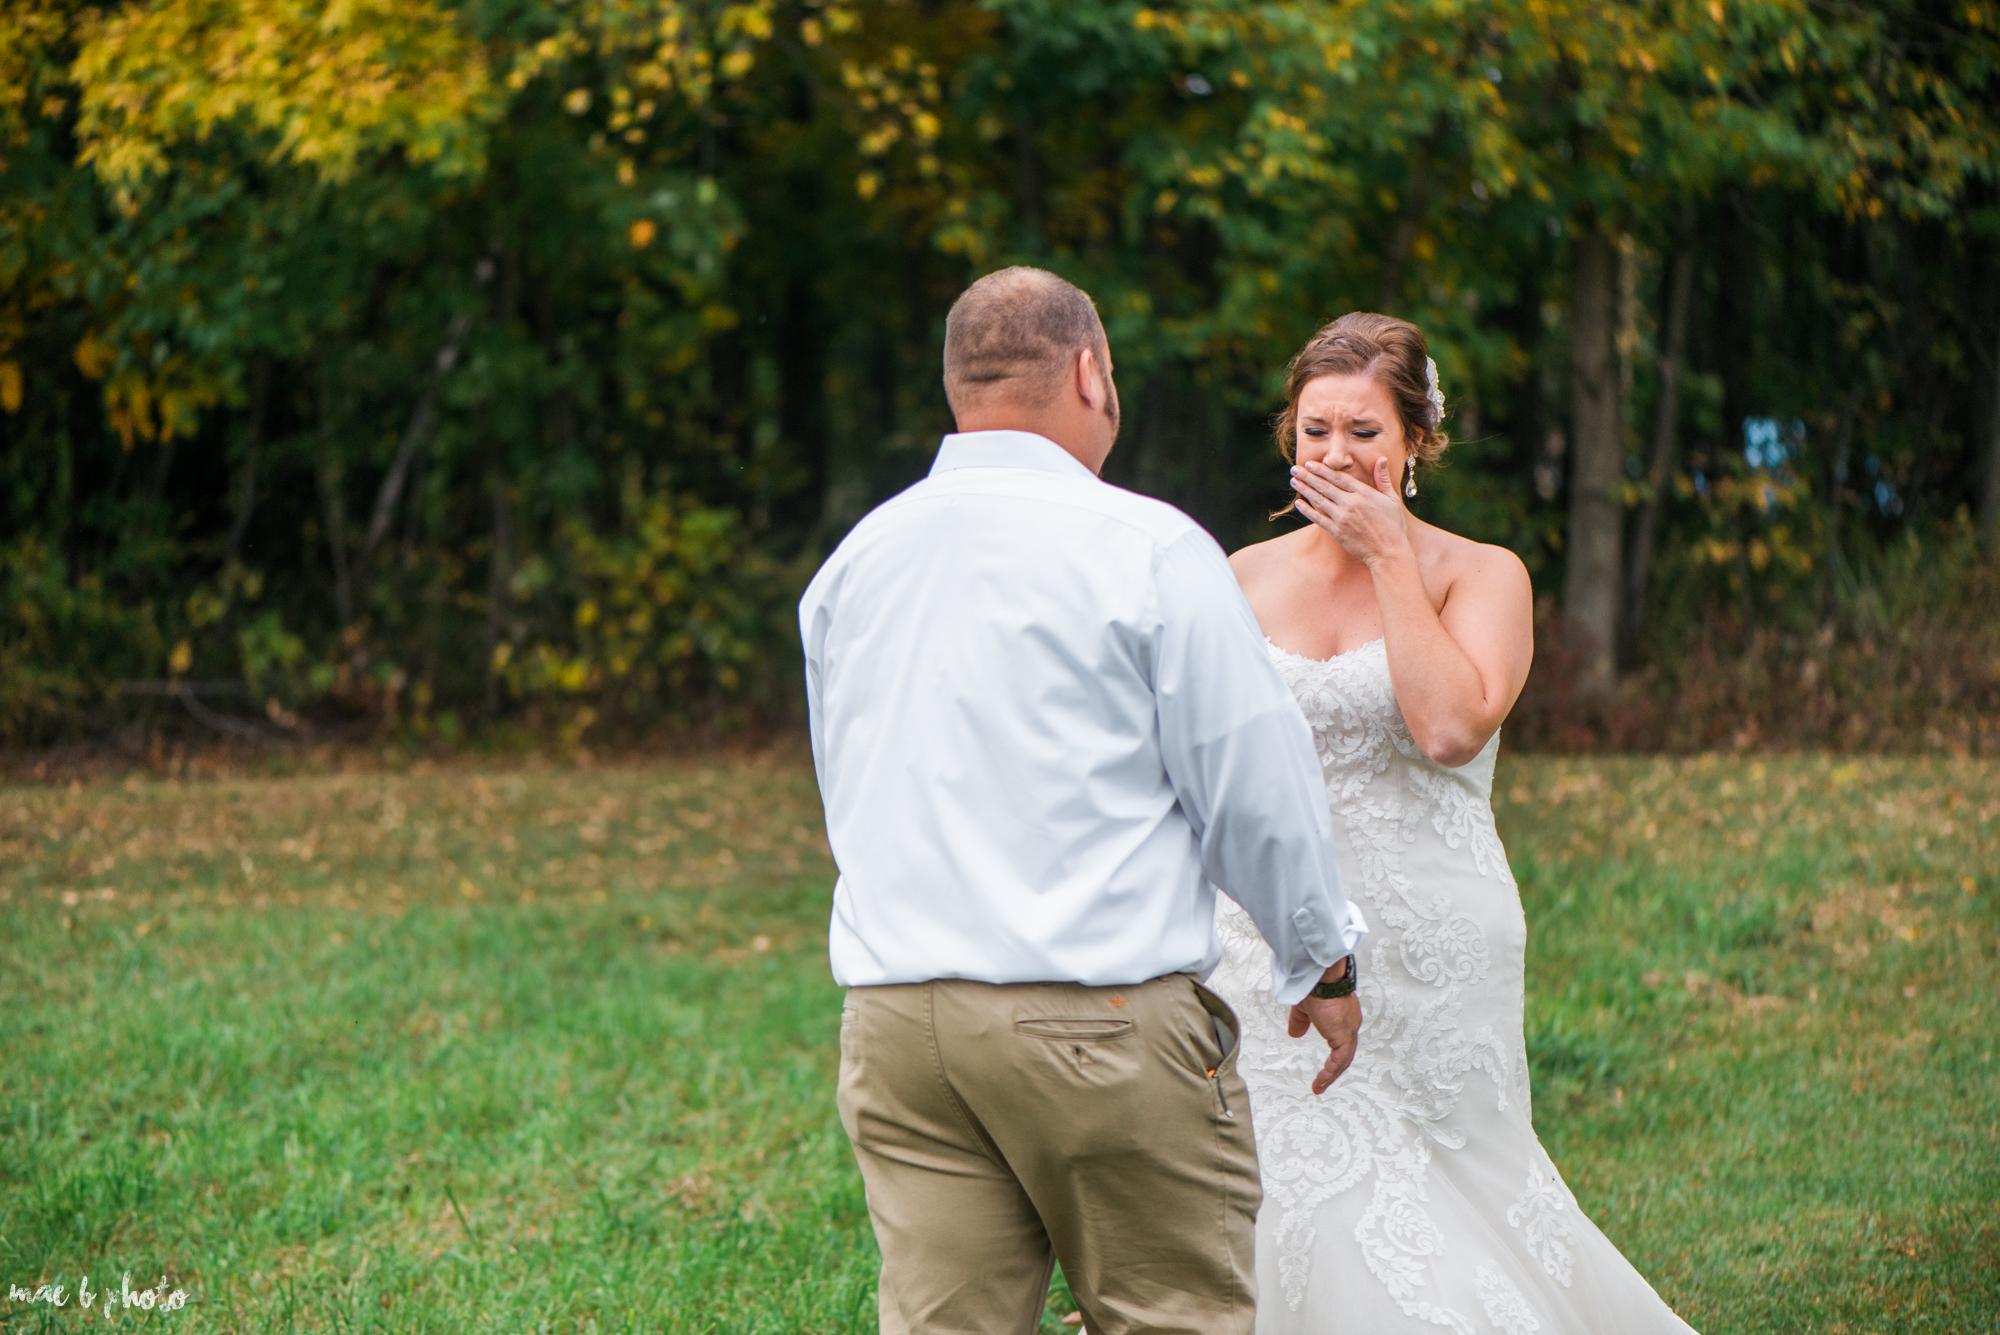 Sarah & Dustin's Rustic Chic Barn Wedding at Hartford Hill Winery in Hartford, Ohio by Mae B Photo-60.jpg